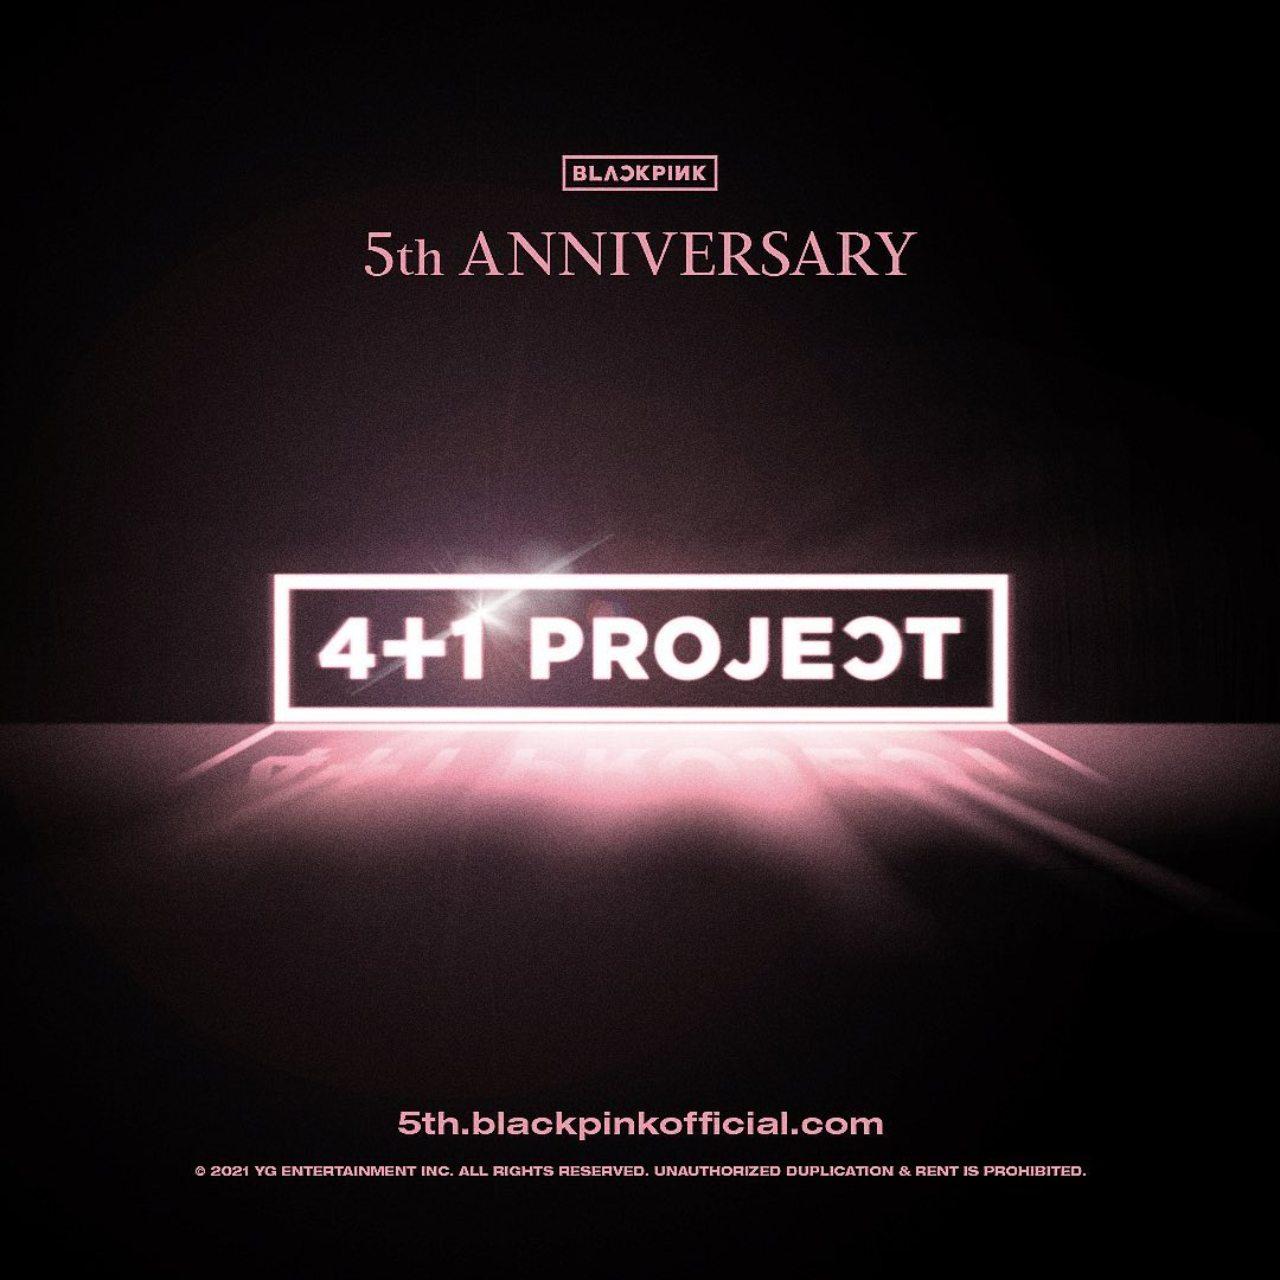 Project 41 Blackpink que es